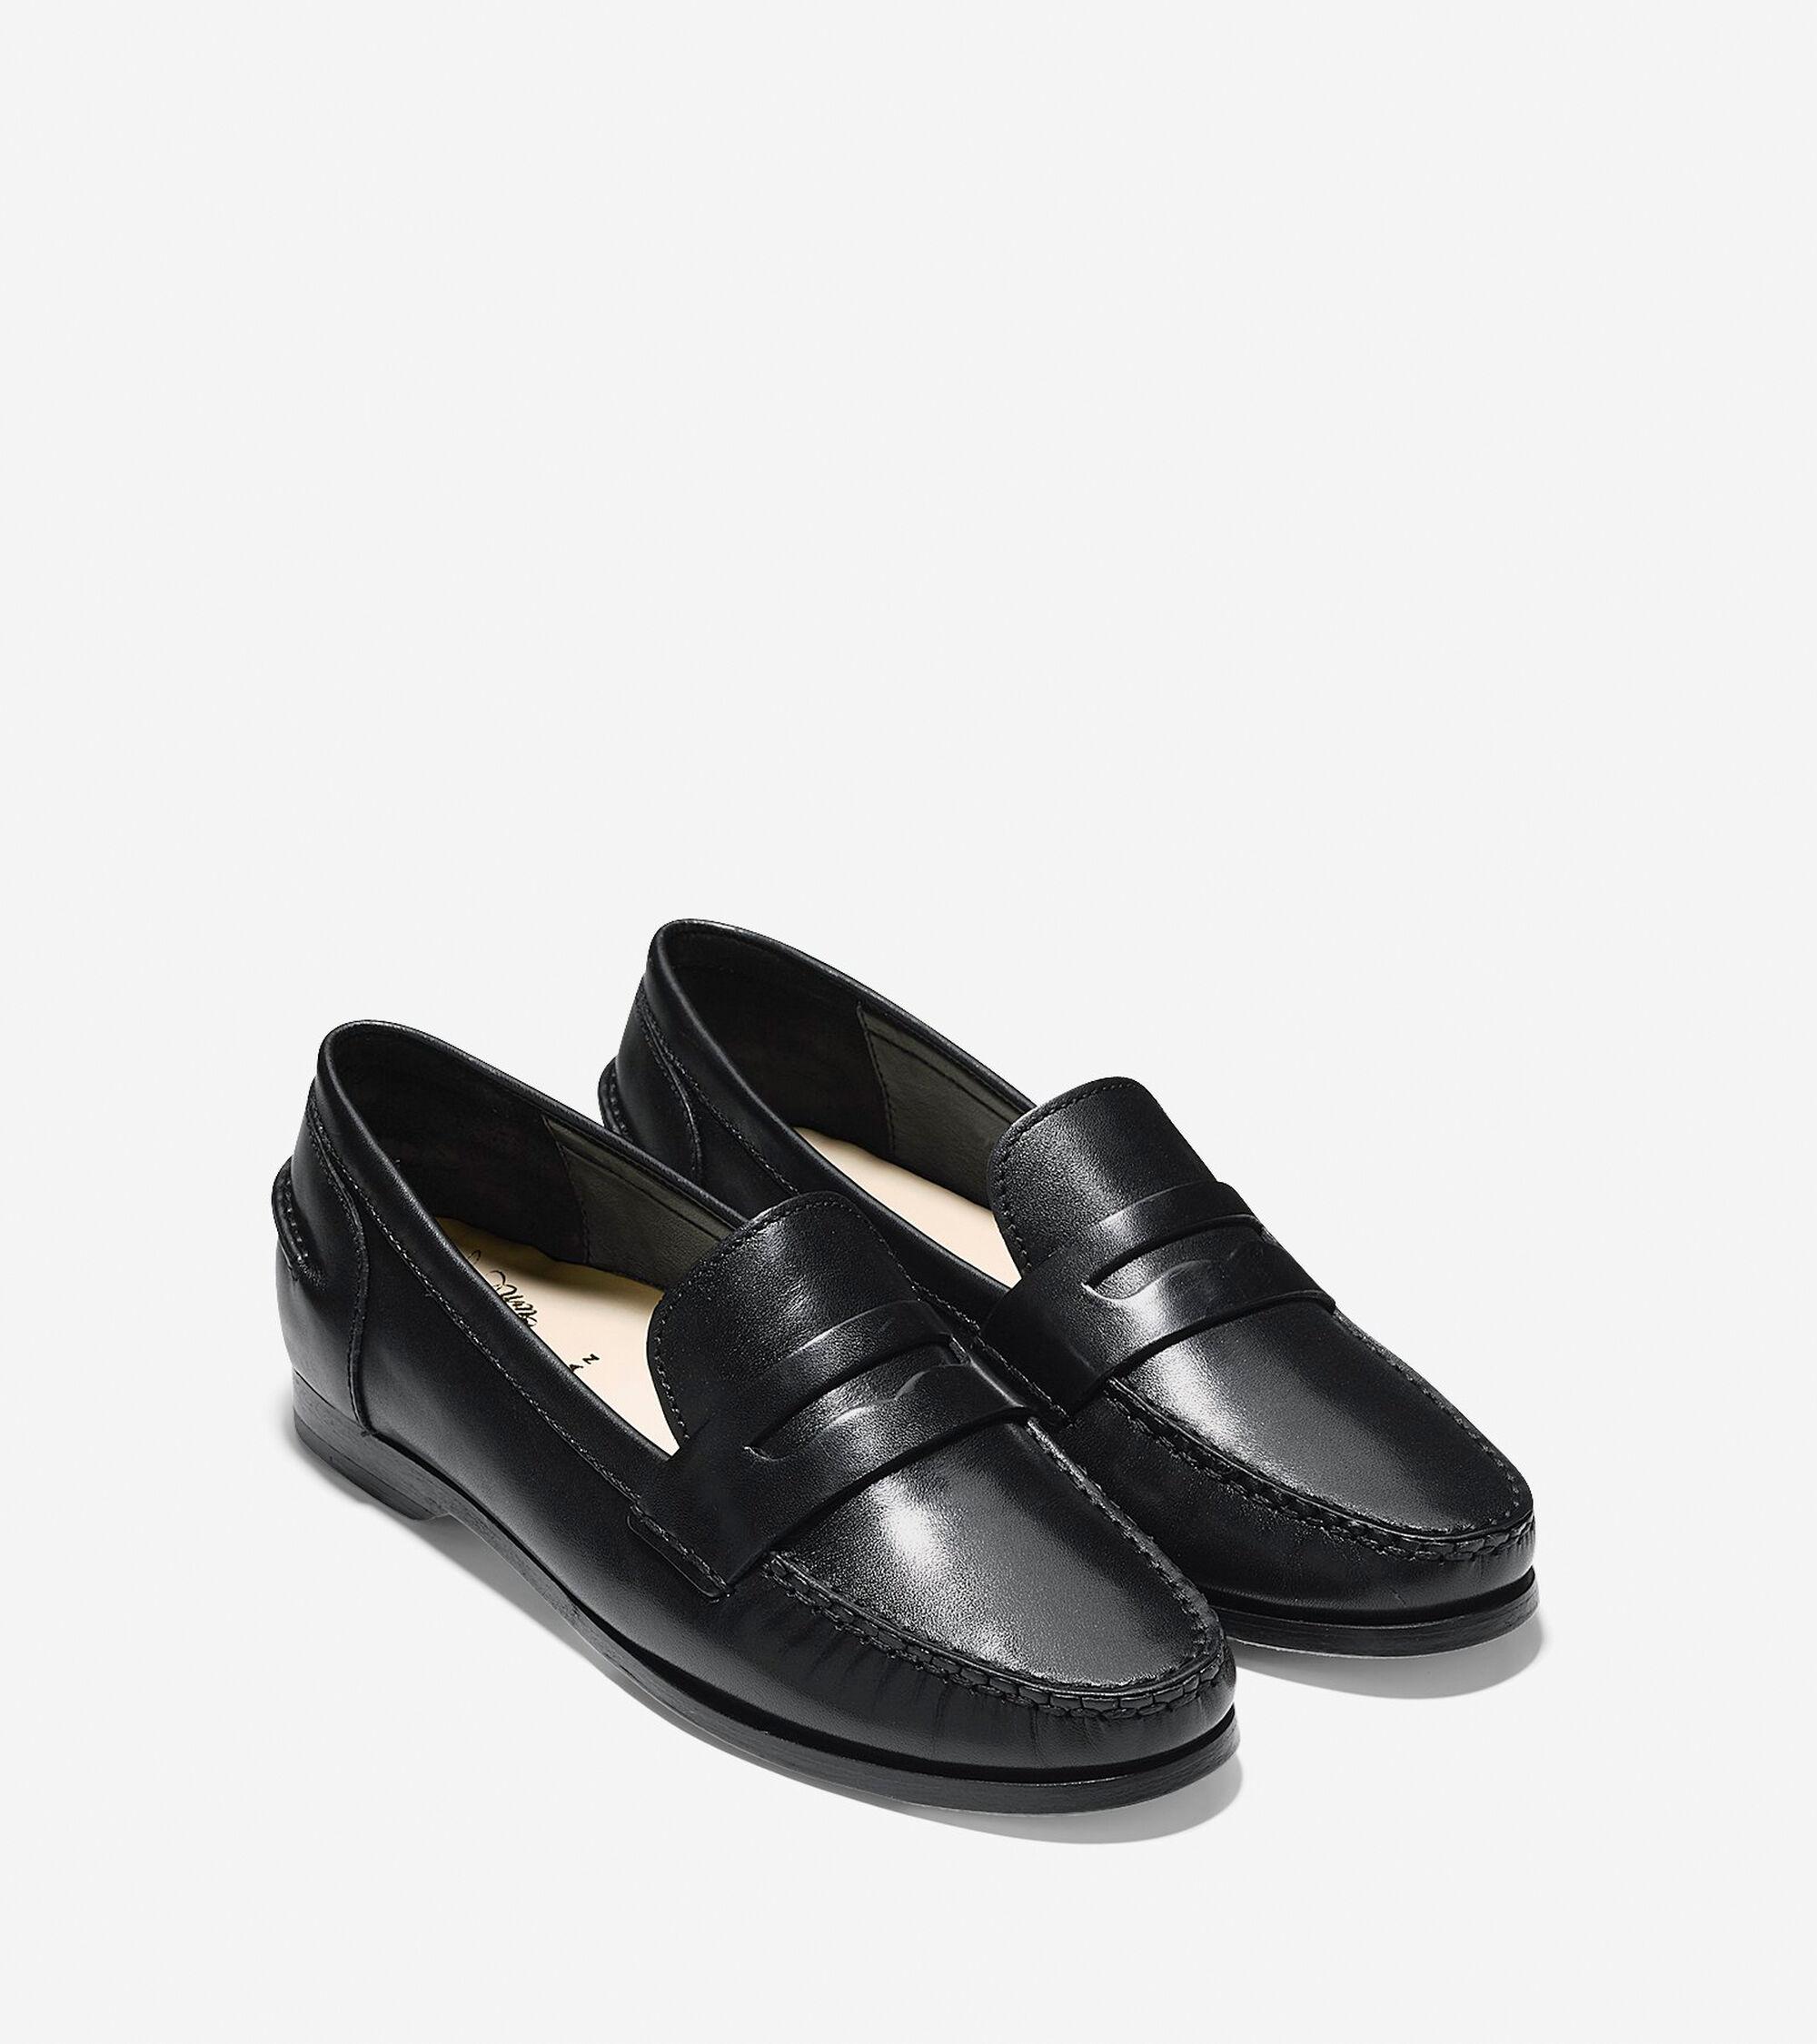 51b61464fb7 Women s Pinch Grand Penny Loafers in Black